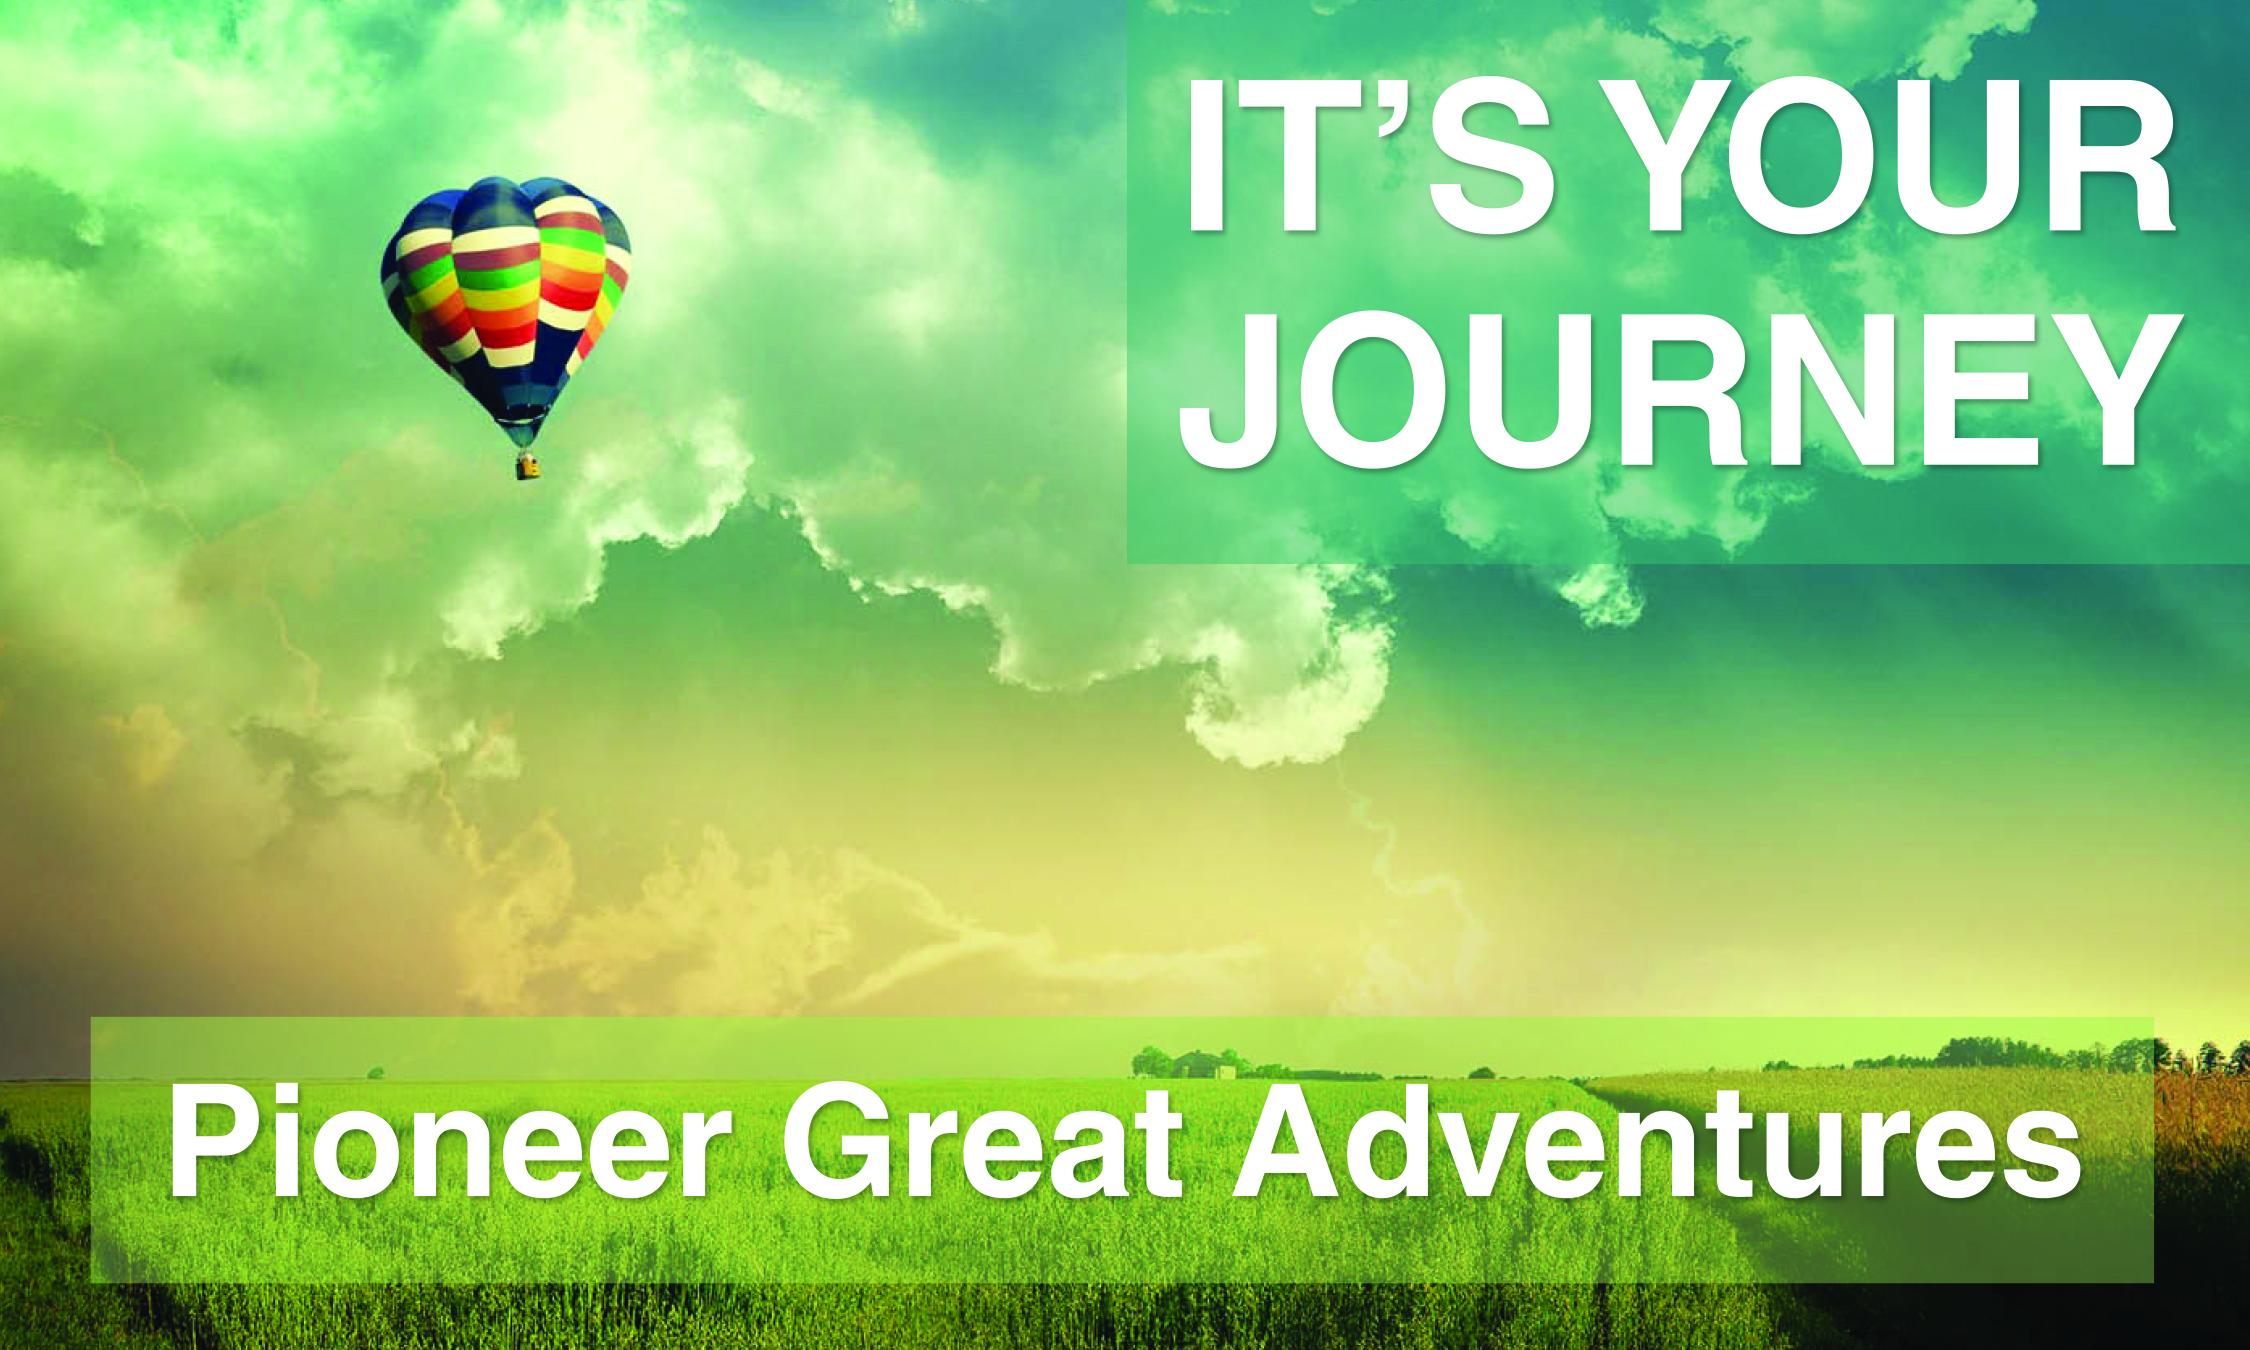 pioneeradventures.jpg